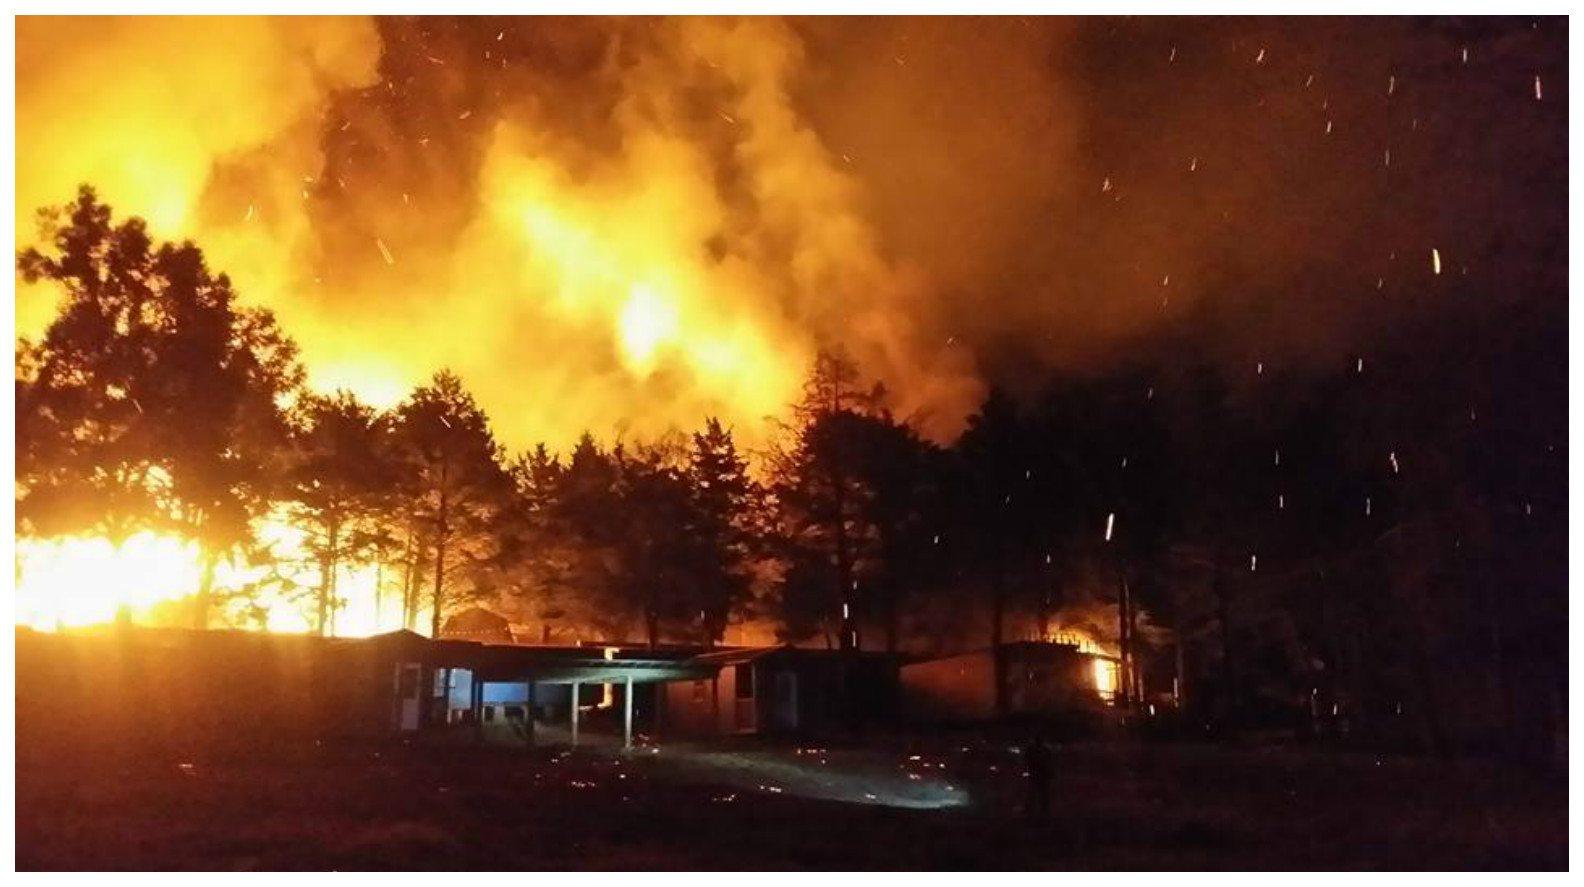 Van Zandt County, Texas: Multiple Agencies Contain Fire at 'The Mountain' Flea Market